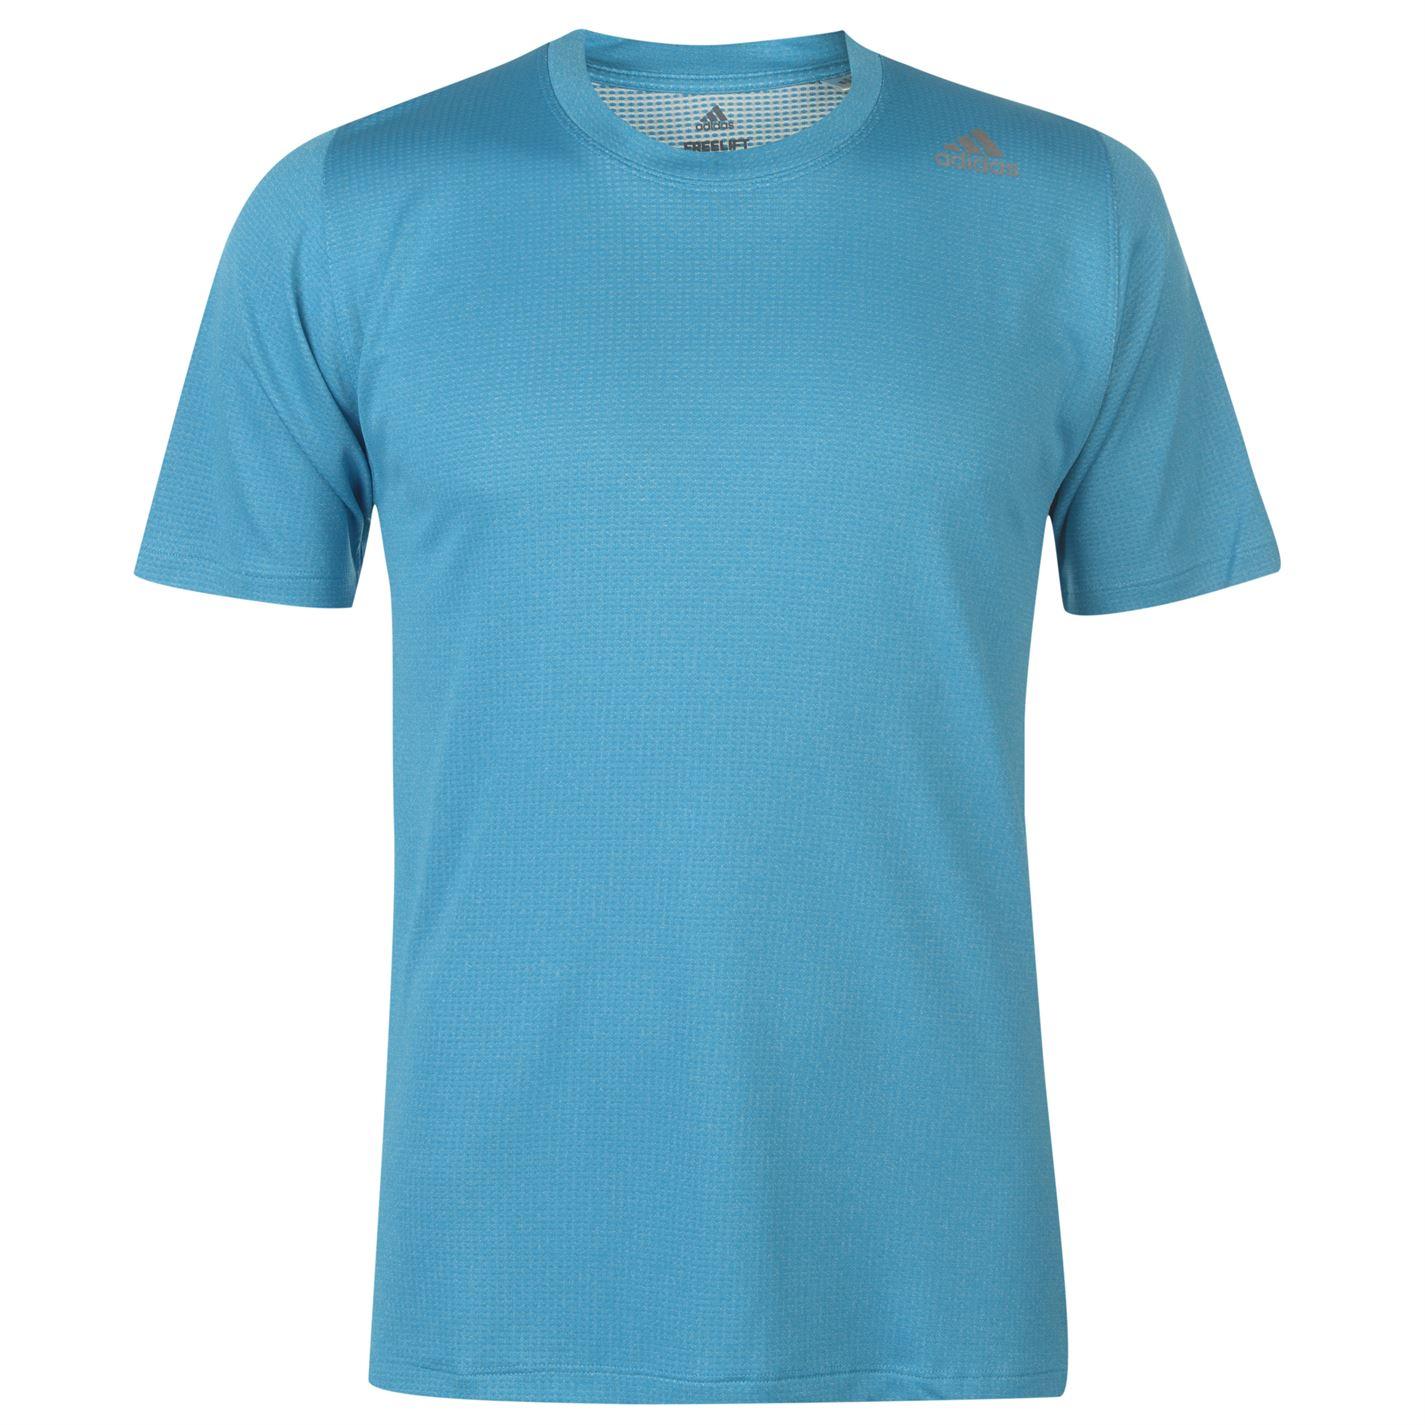 Triko adidas Messi Graphic T Shirt dětské Boys